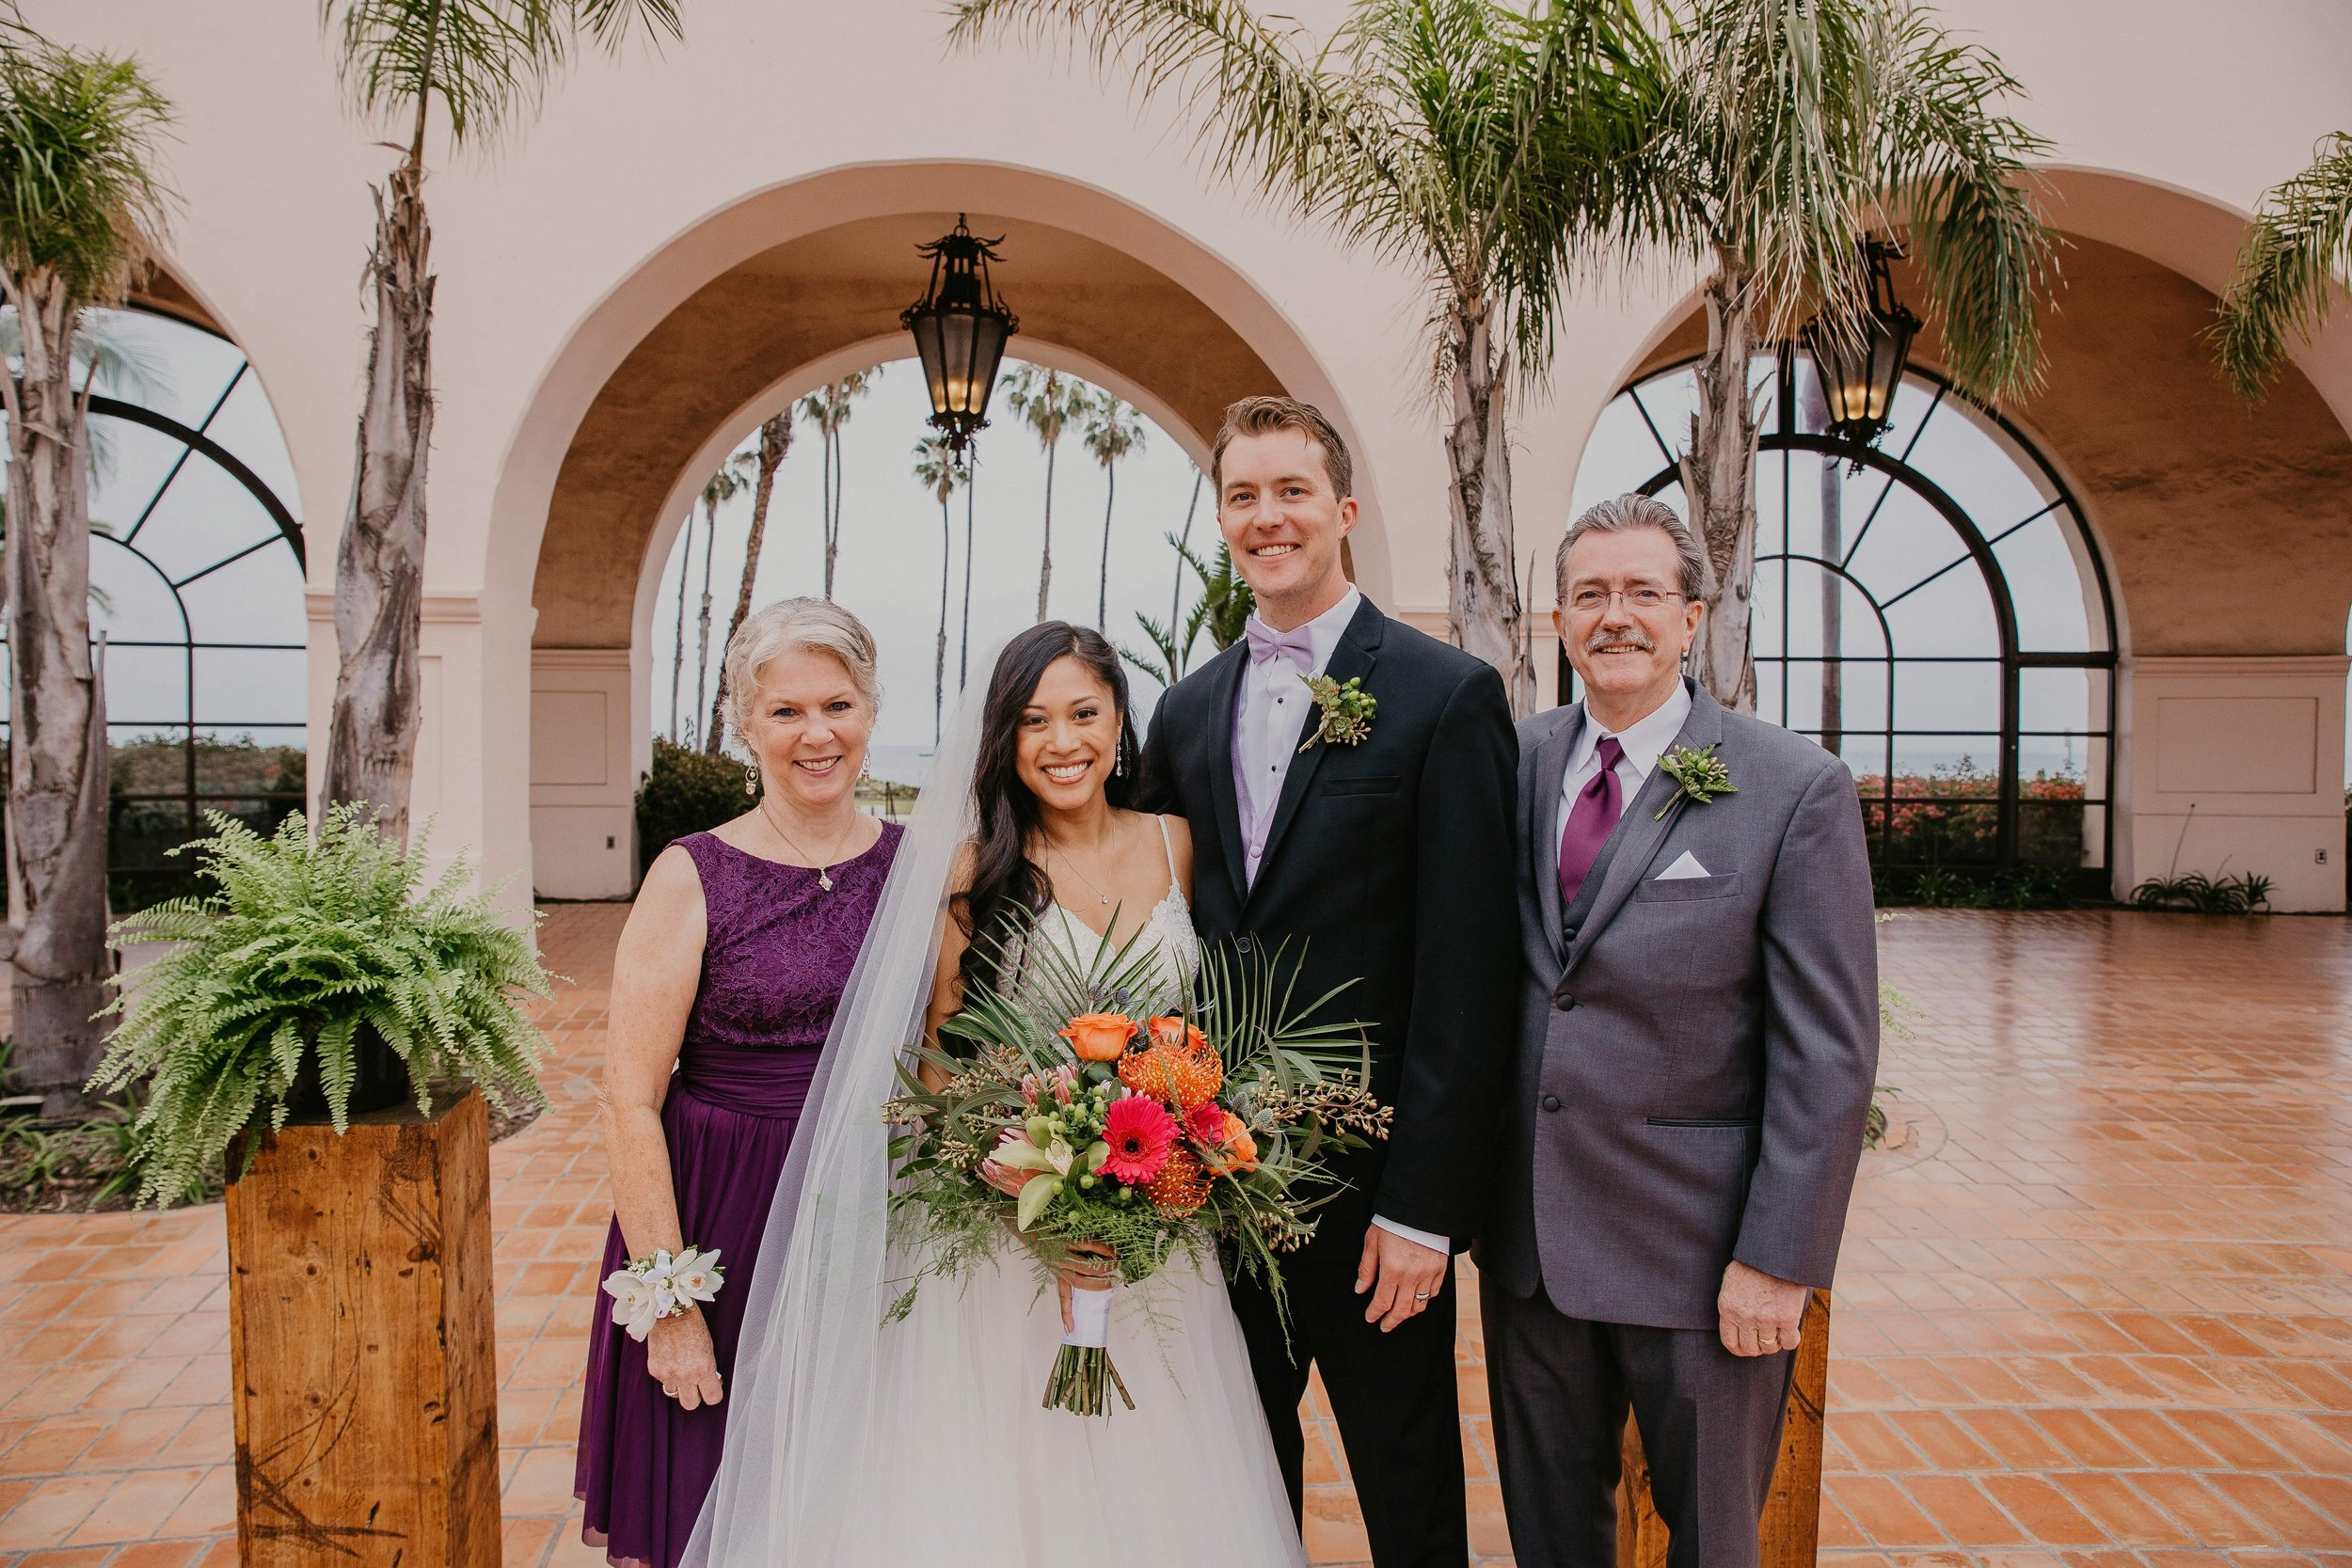 www.santabarbarawedding.com | Candice Marie Photography | Hilton Santa Barbara Beachfront Resort | Dalina Klan | Once in a Lifetime Weddings | Alpha Floral | Bride and Groom with Groom's Parents